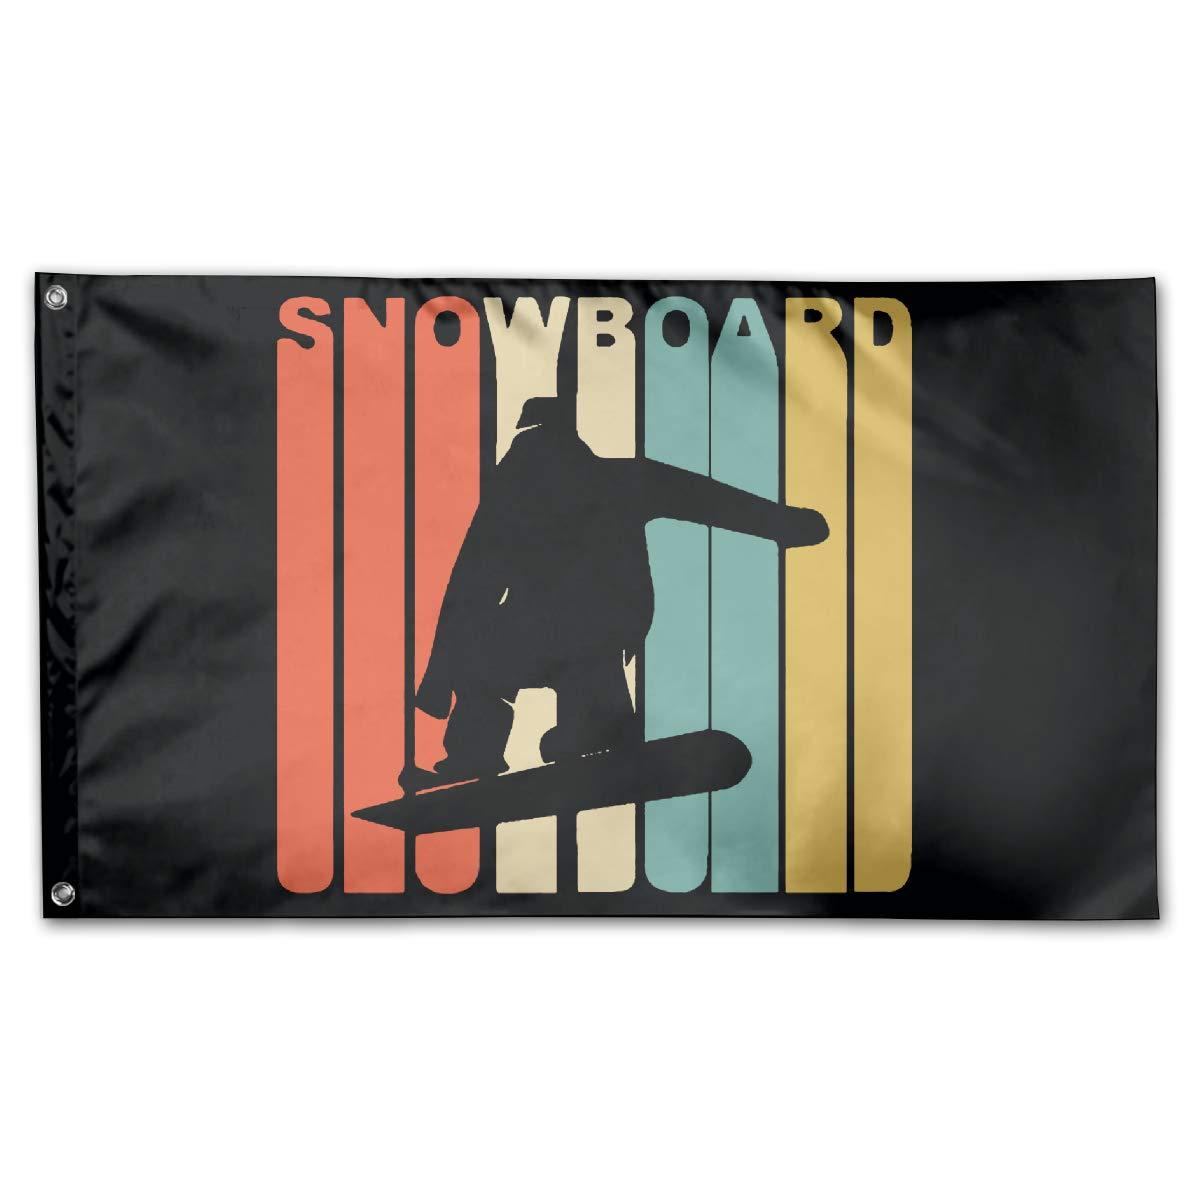 Retro 1970's Style Snowboarder Silhouette Snowboard Indoor/Outdoor Banner 100% Polyester Flag Garden Flag 3x5